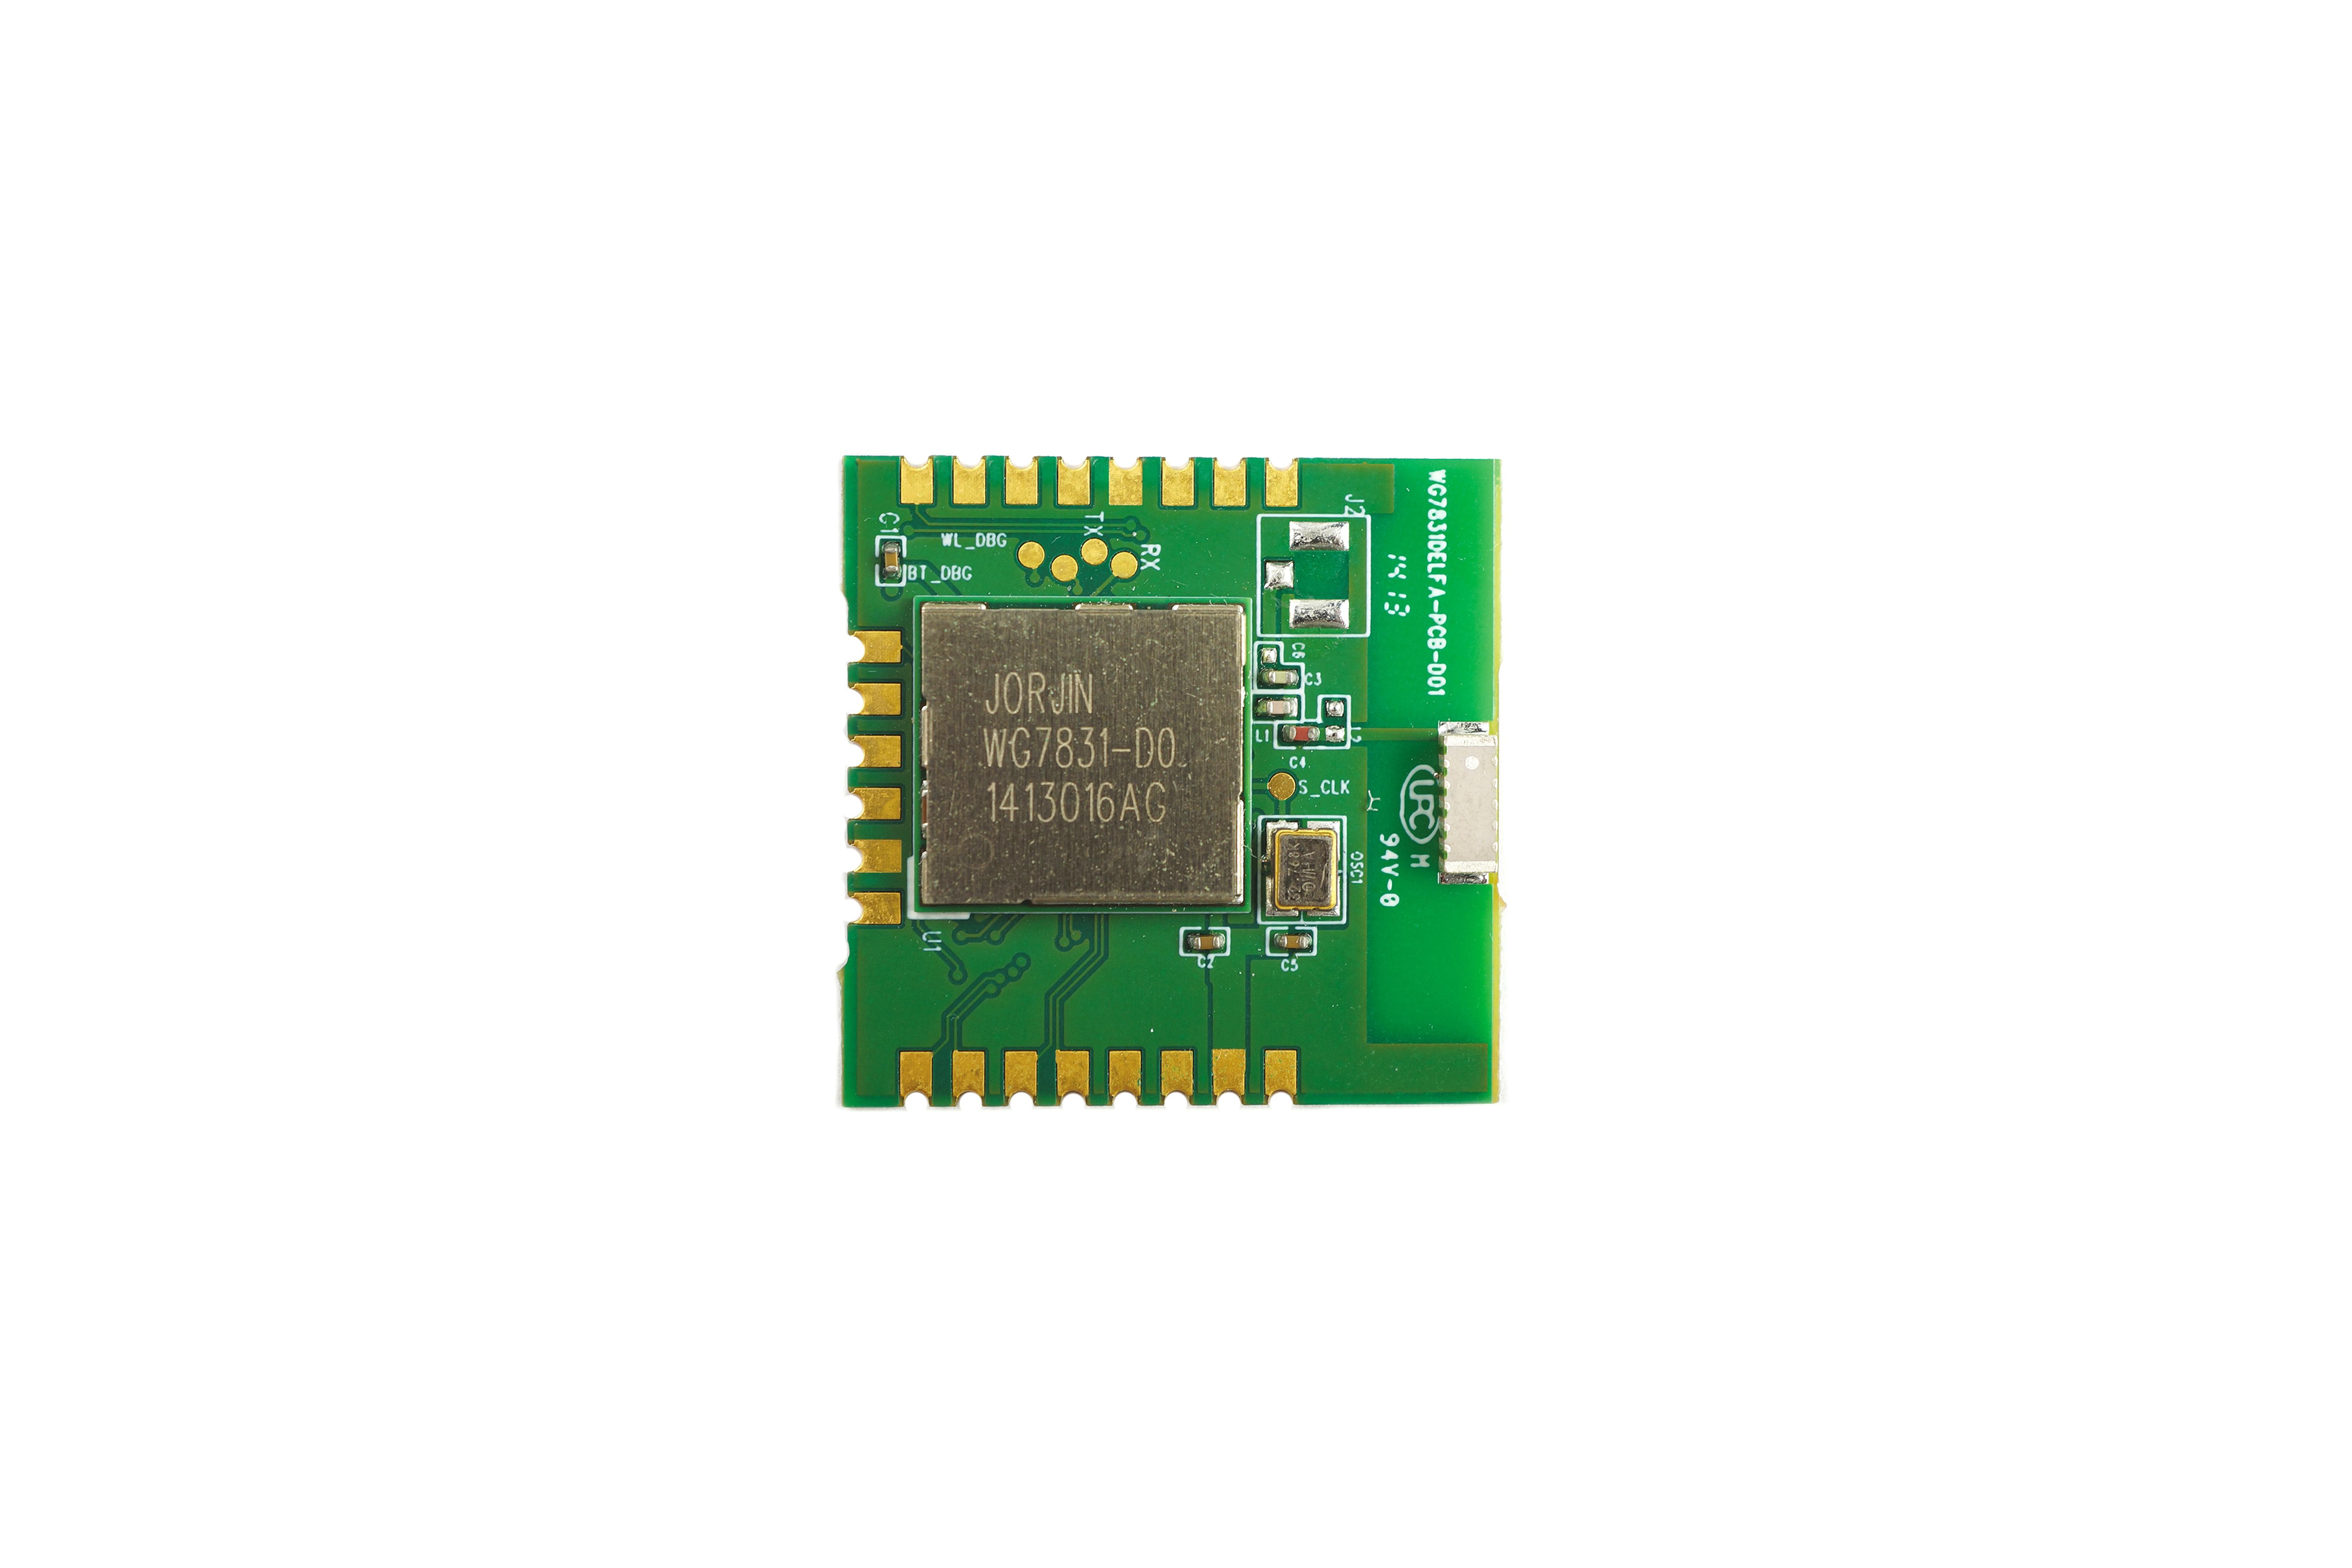 WG7831-DELFA WLAN-Modul, 802.11b/g/n